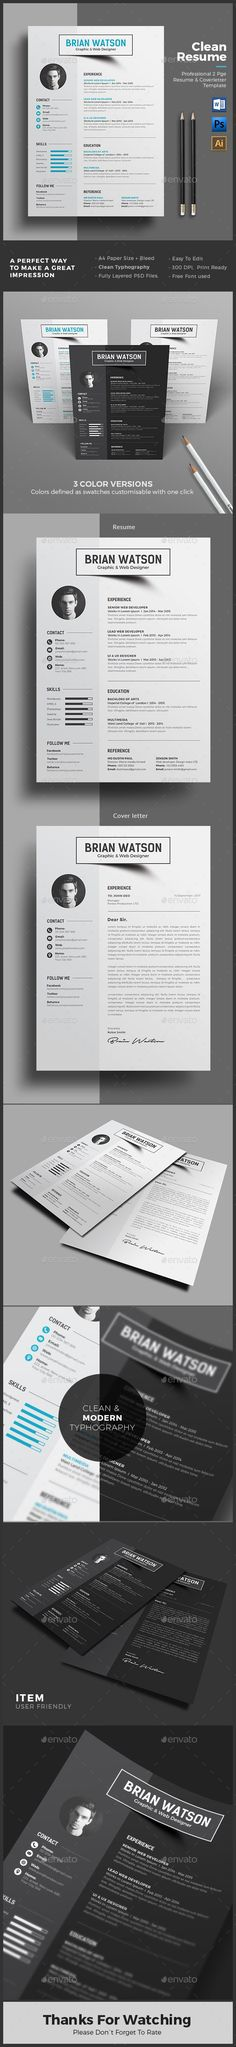 Resume Template PSD, AI Illustrator, MS Word. Download here: https://graphicriver.net/item/resume/17149731?ref=ksioks